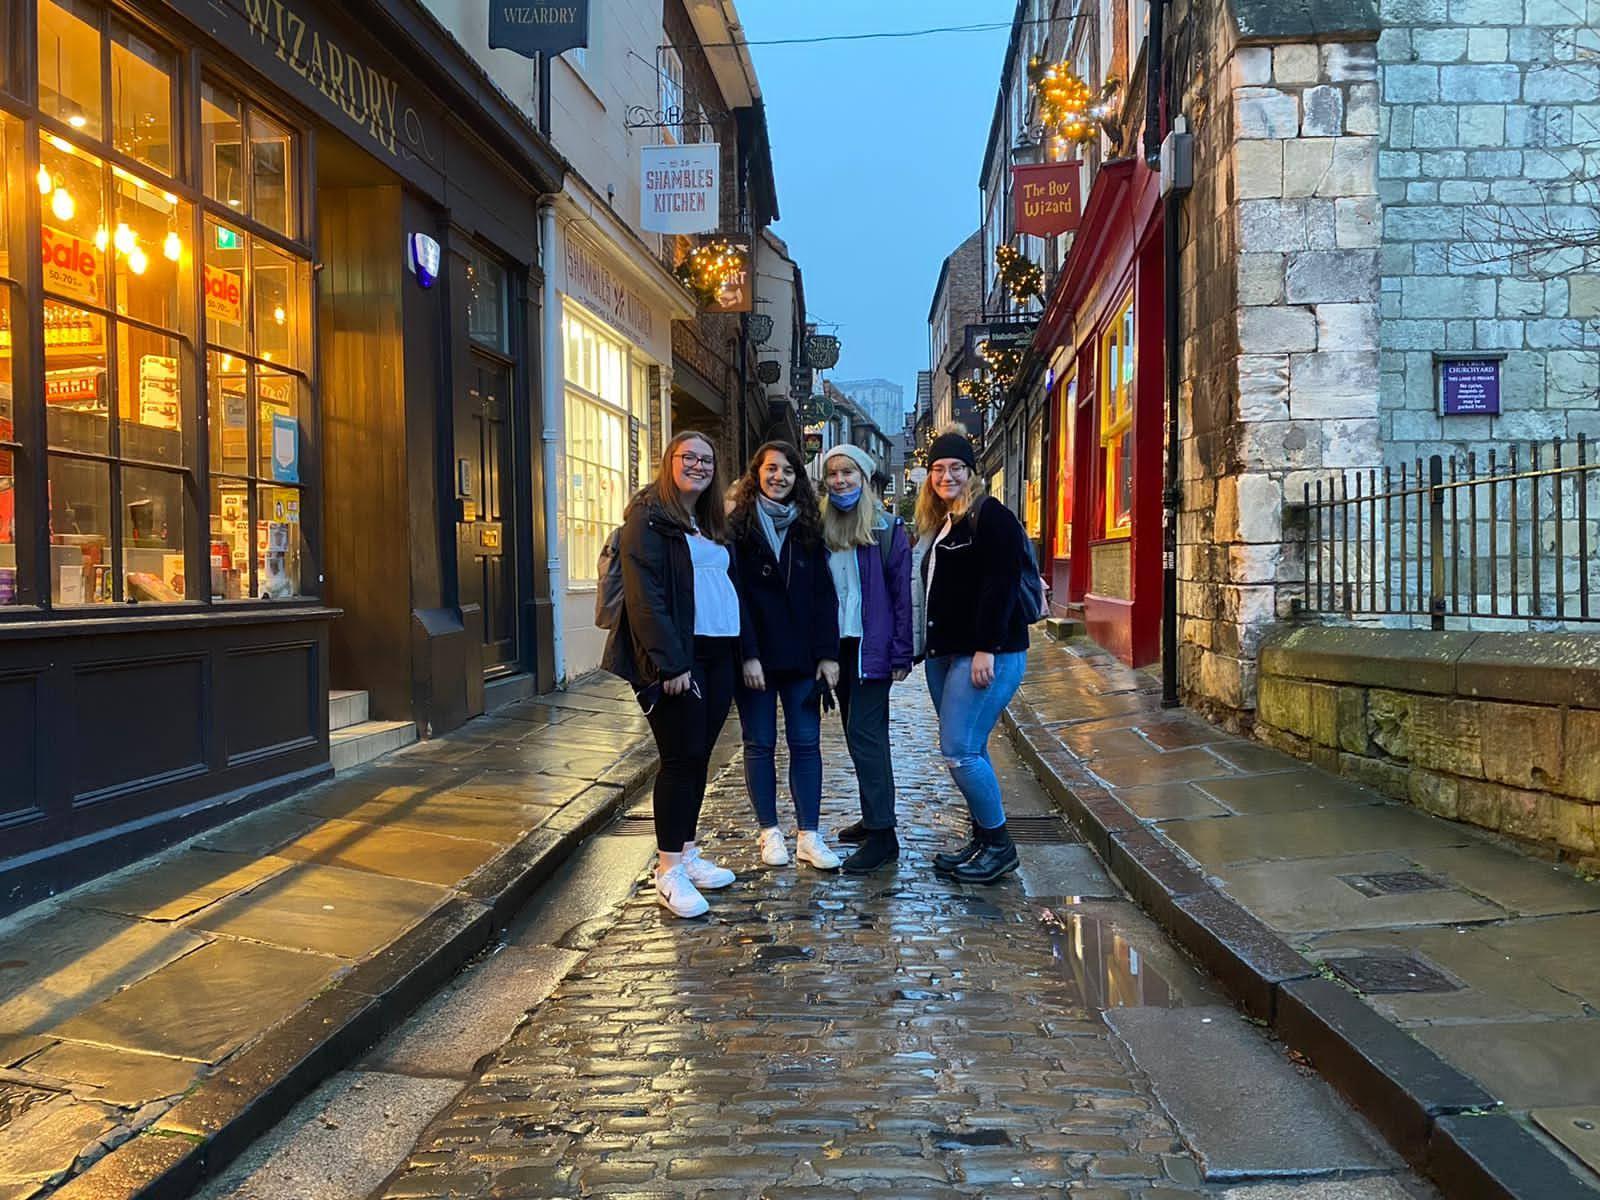 University of York students visit The Shambles